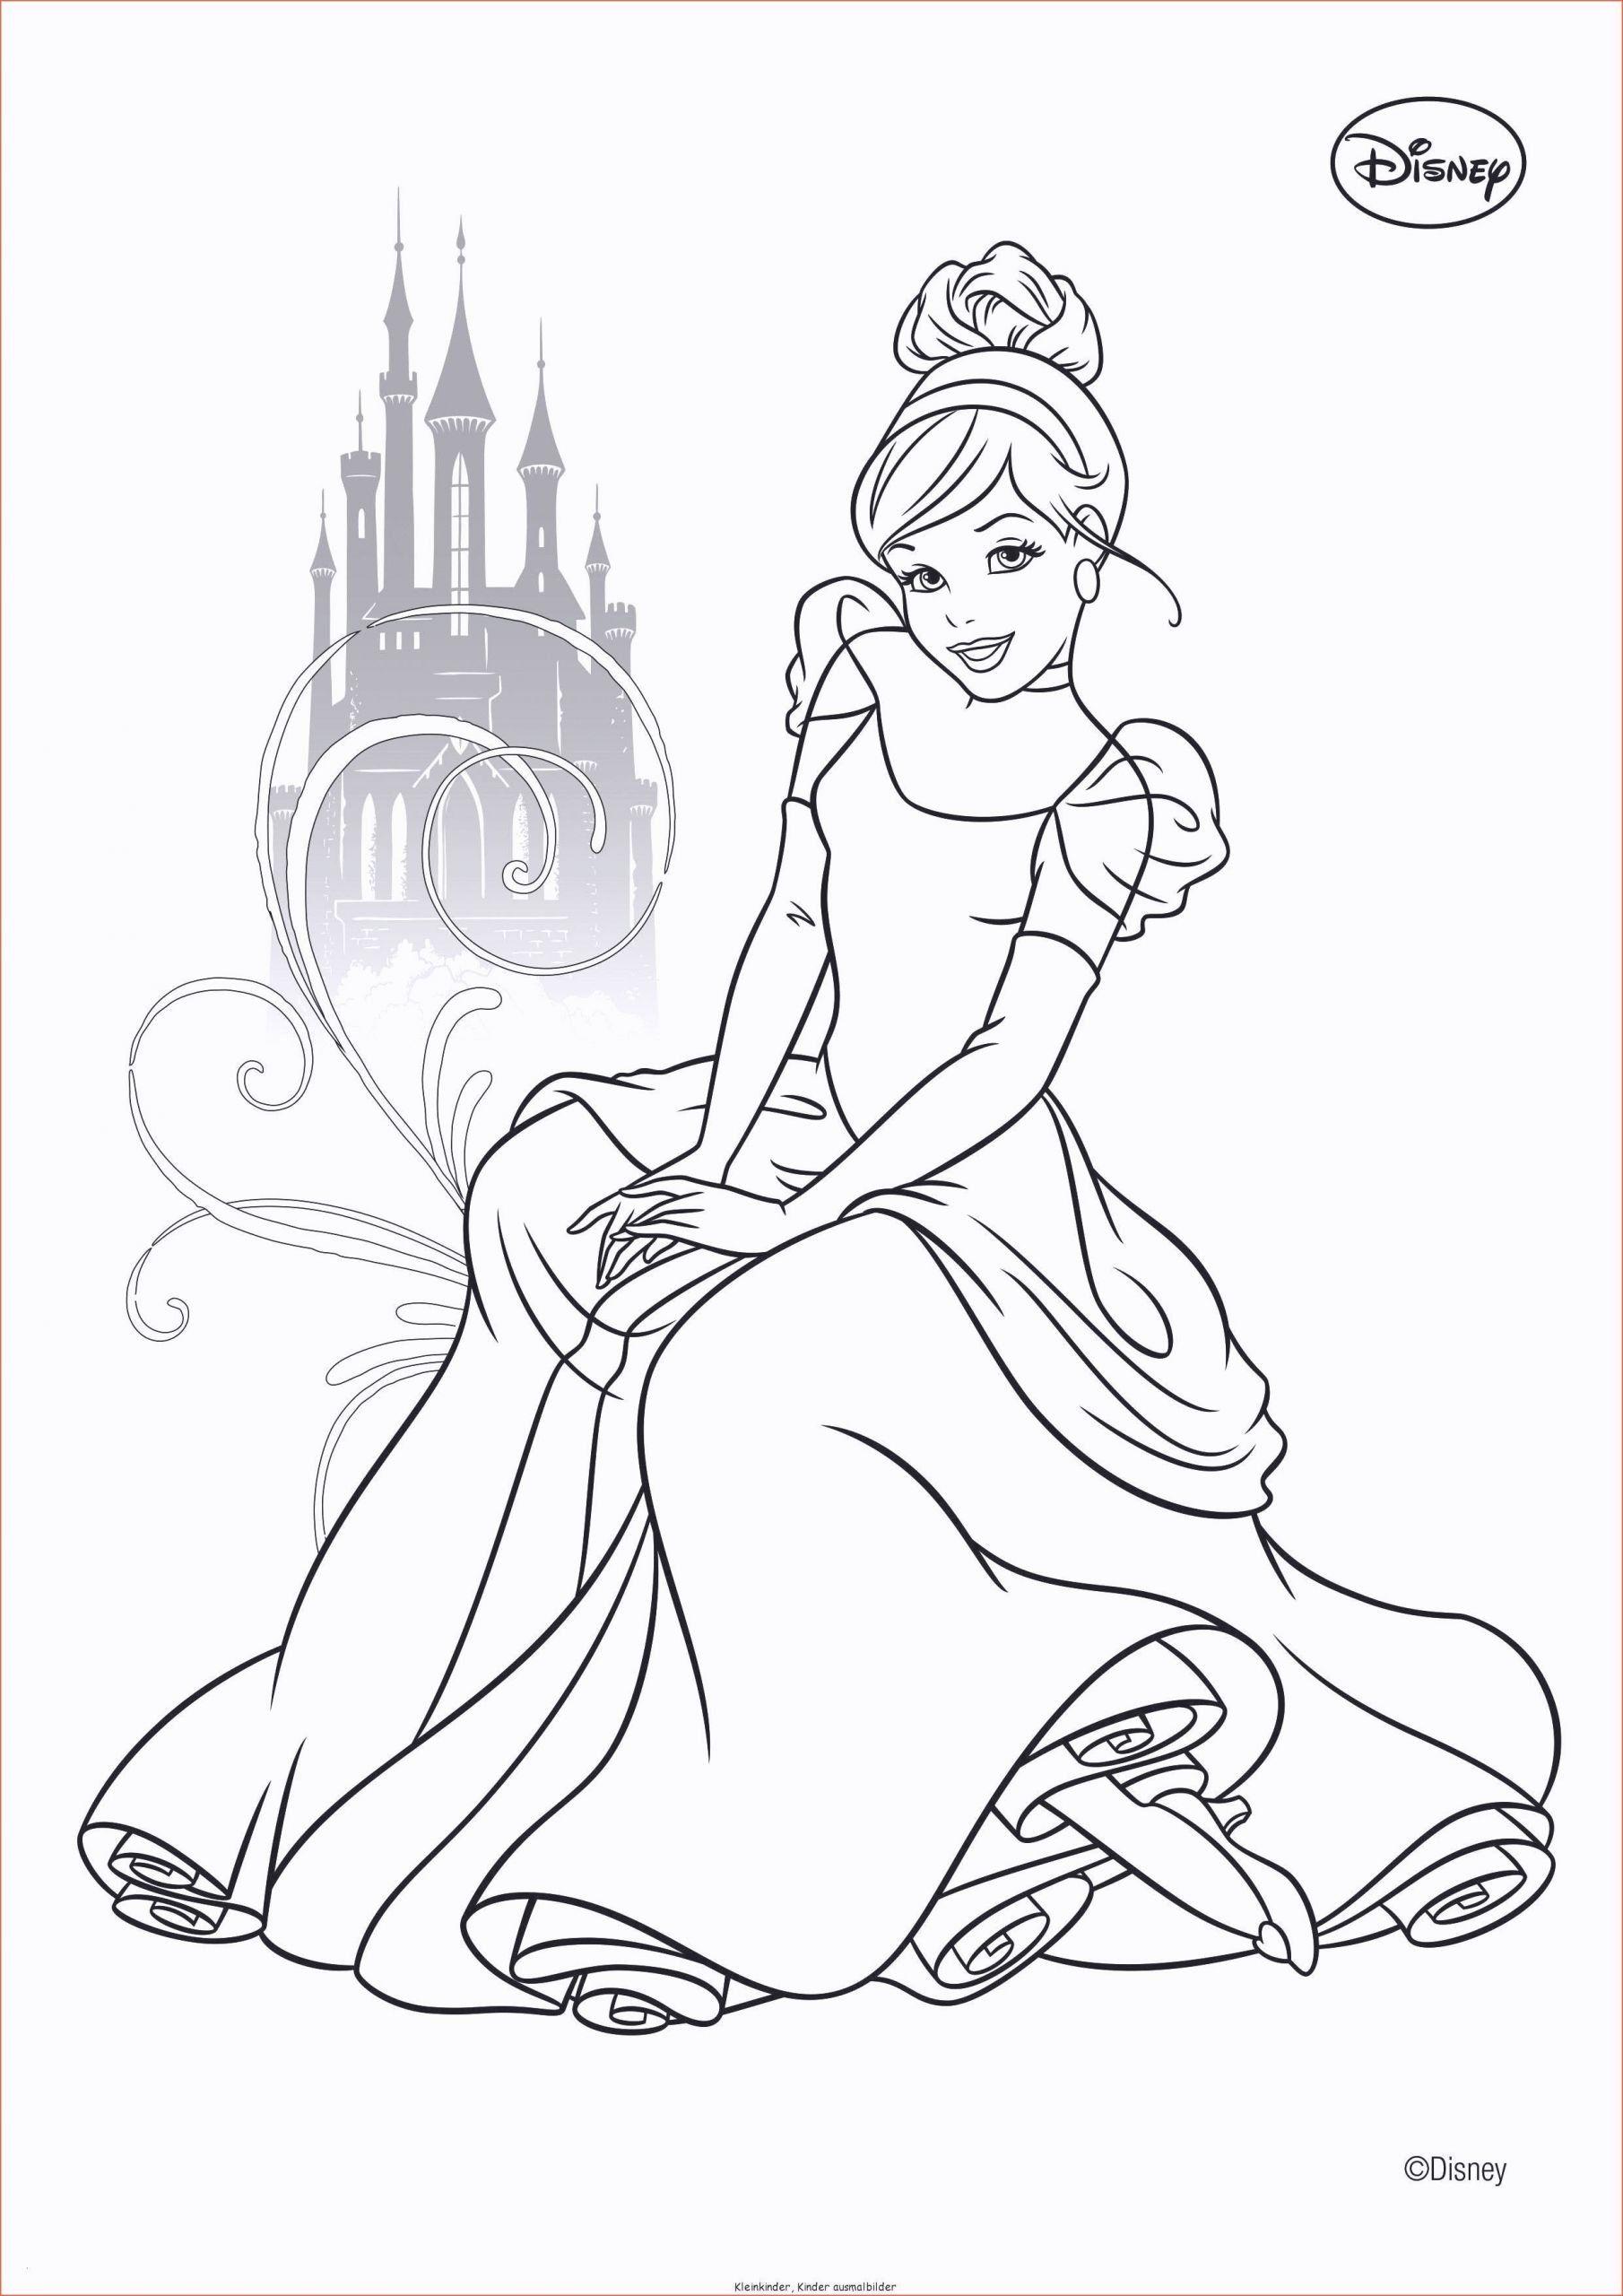 Valentine Coloring Pages For Boys Unique Pin Auf Malvorlagen Kinder Disney Princess Coloring Pages Princess Coloring Pages Disney Coloring Pages